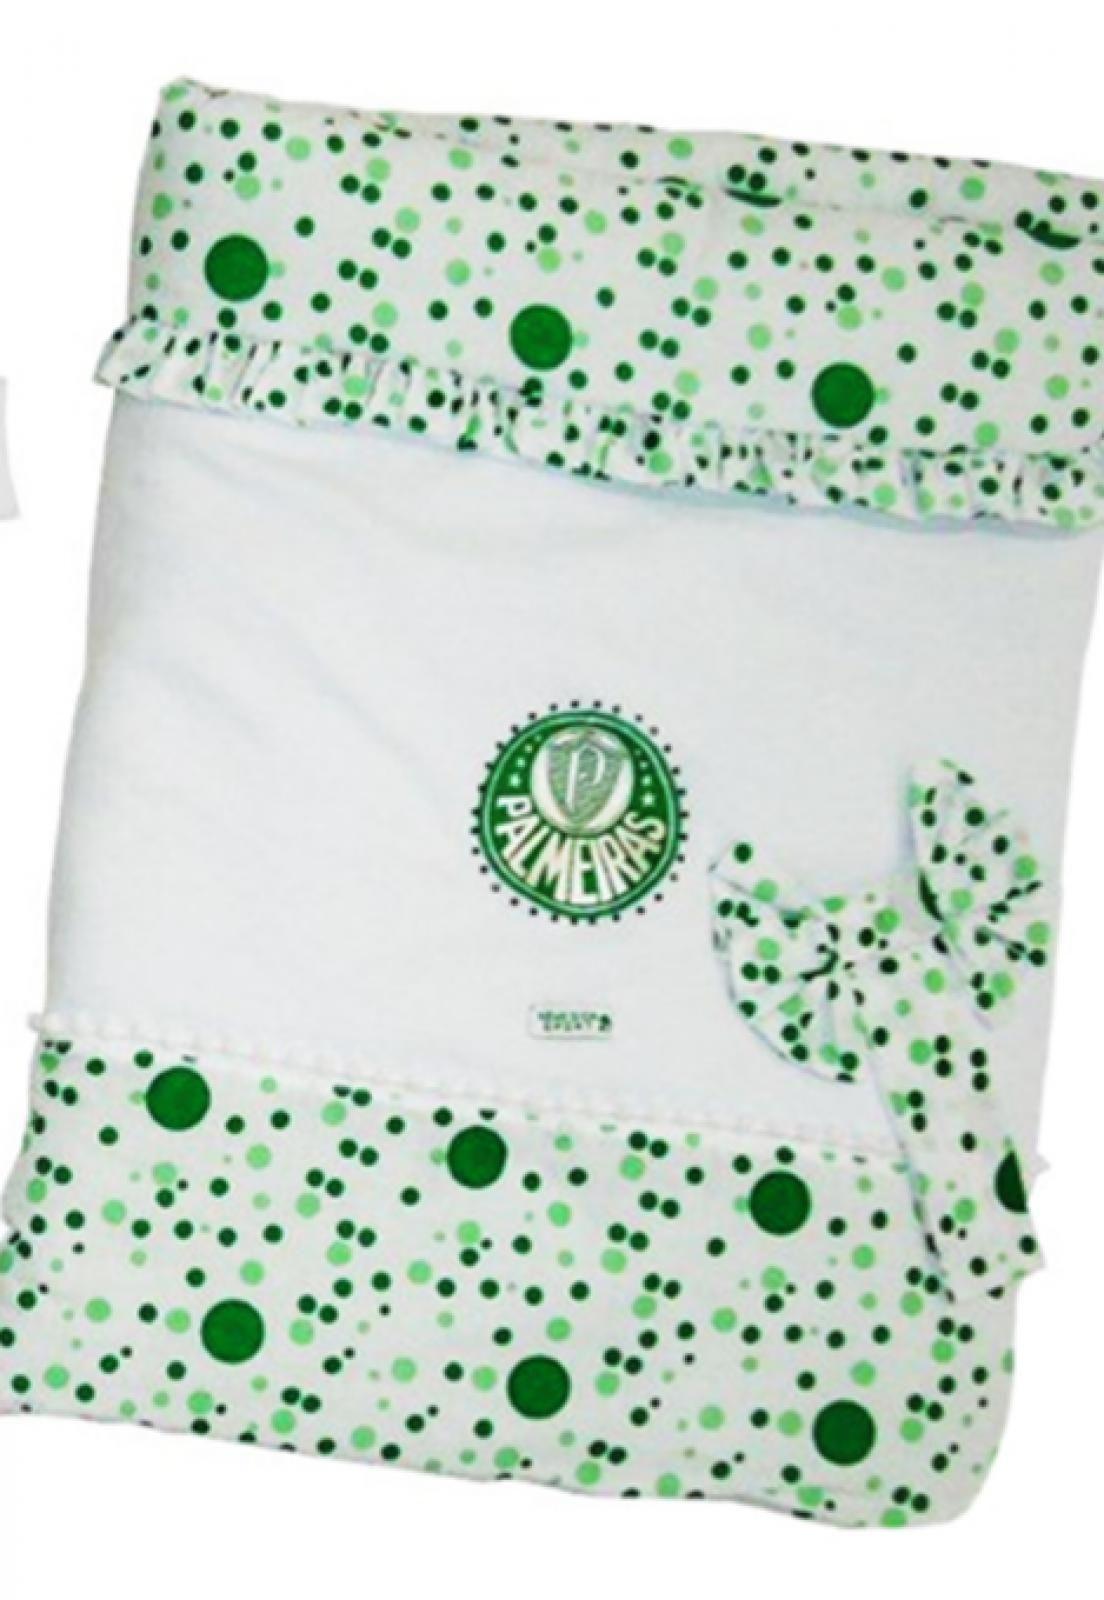 358fb4a87d59f3 Kit Bebê Reve D'or Sport Macacão Vestido Palmeiras Branco | Products ...